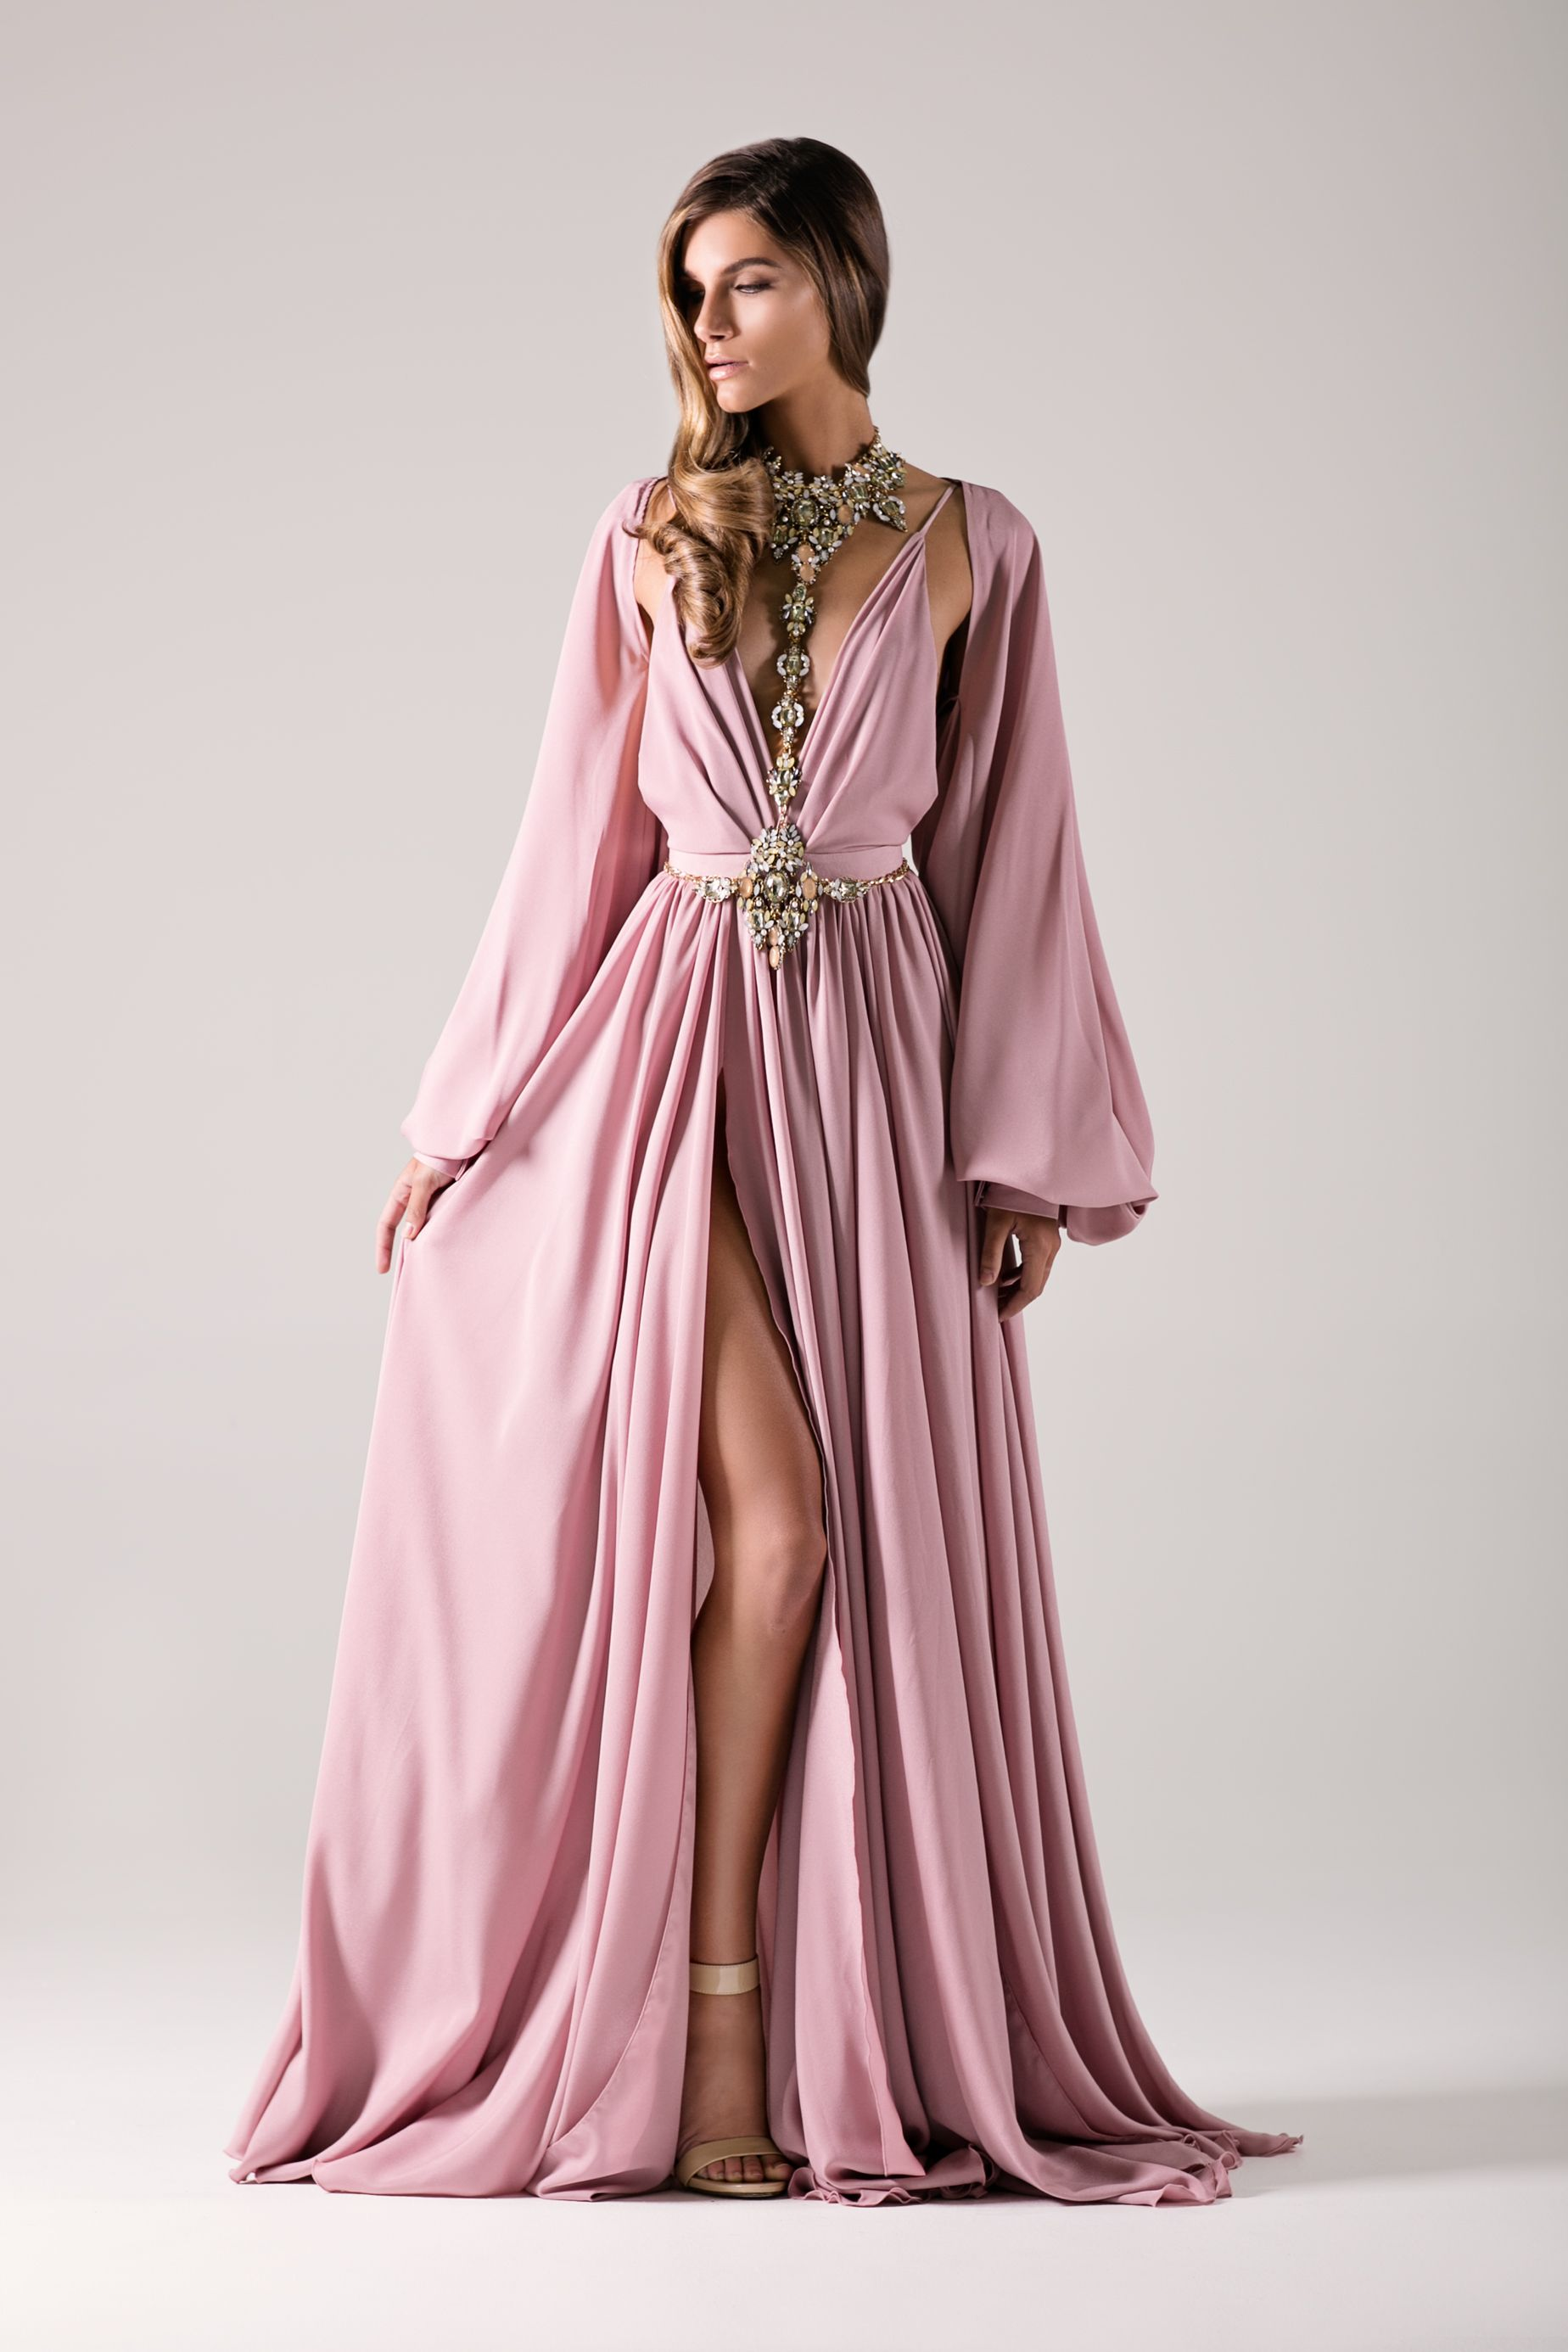 Pin de Dahiana Muñoz en alta costura | Pinterest | Moda rosada, Alta ...